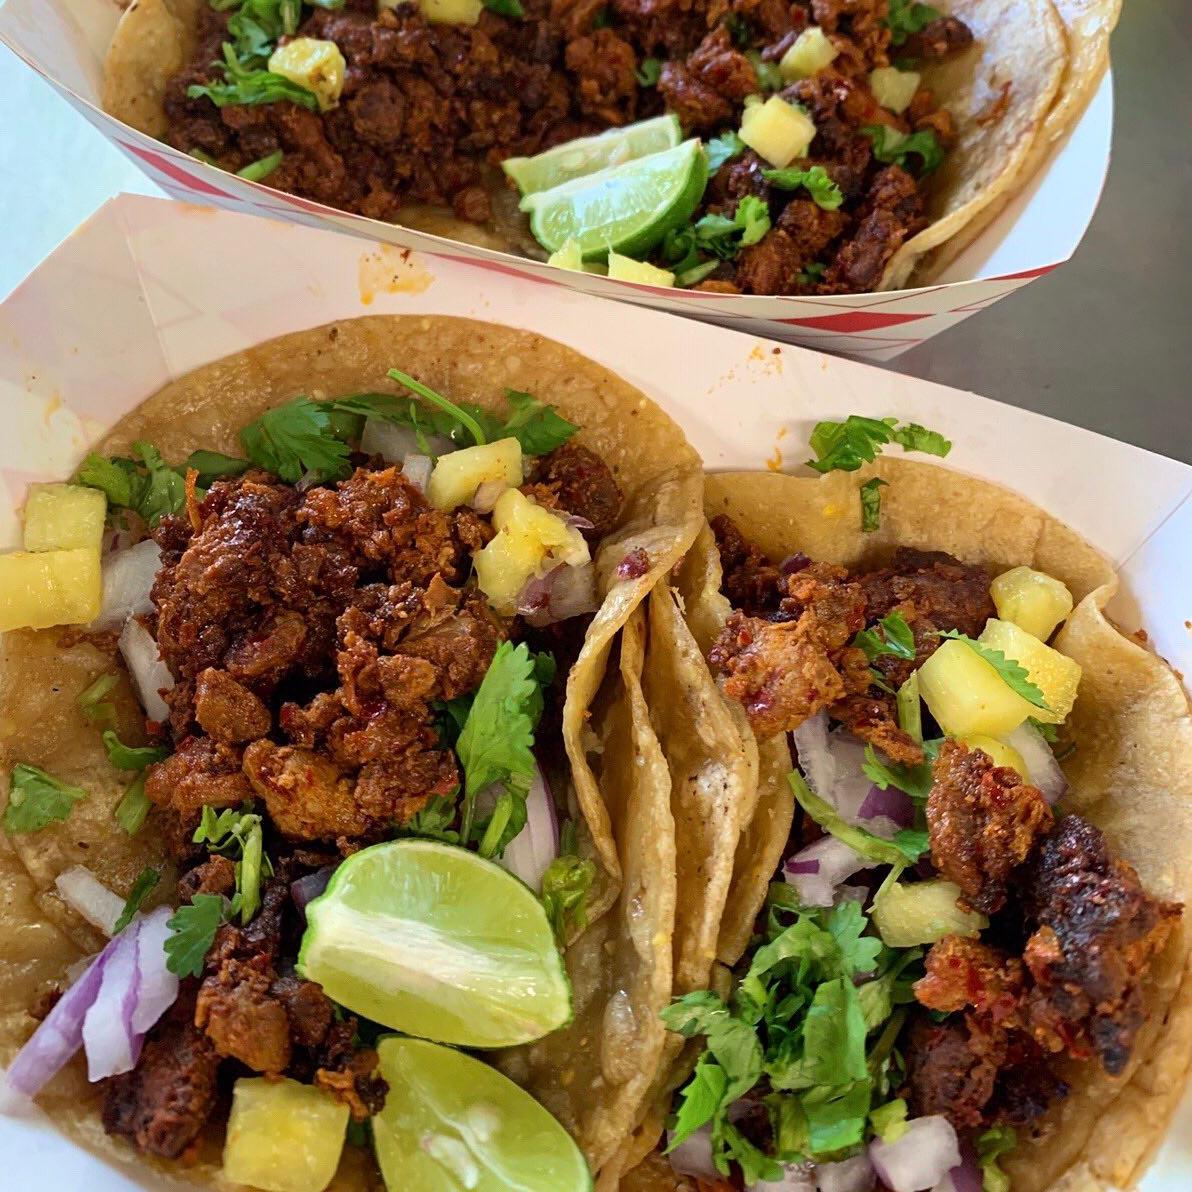 Taconmaye Mexican Food Truck logo